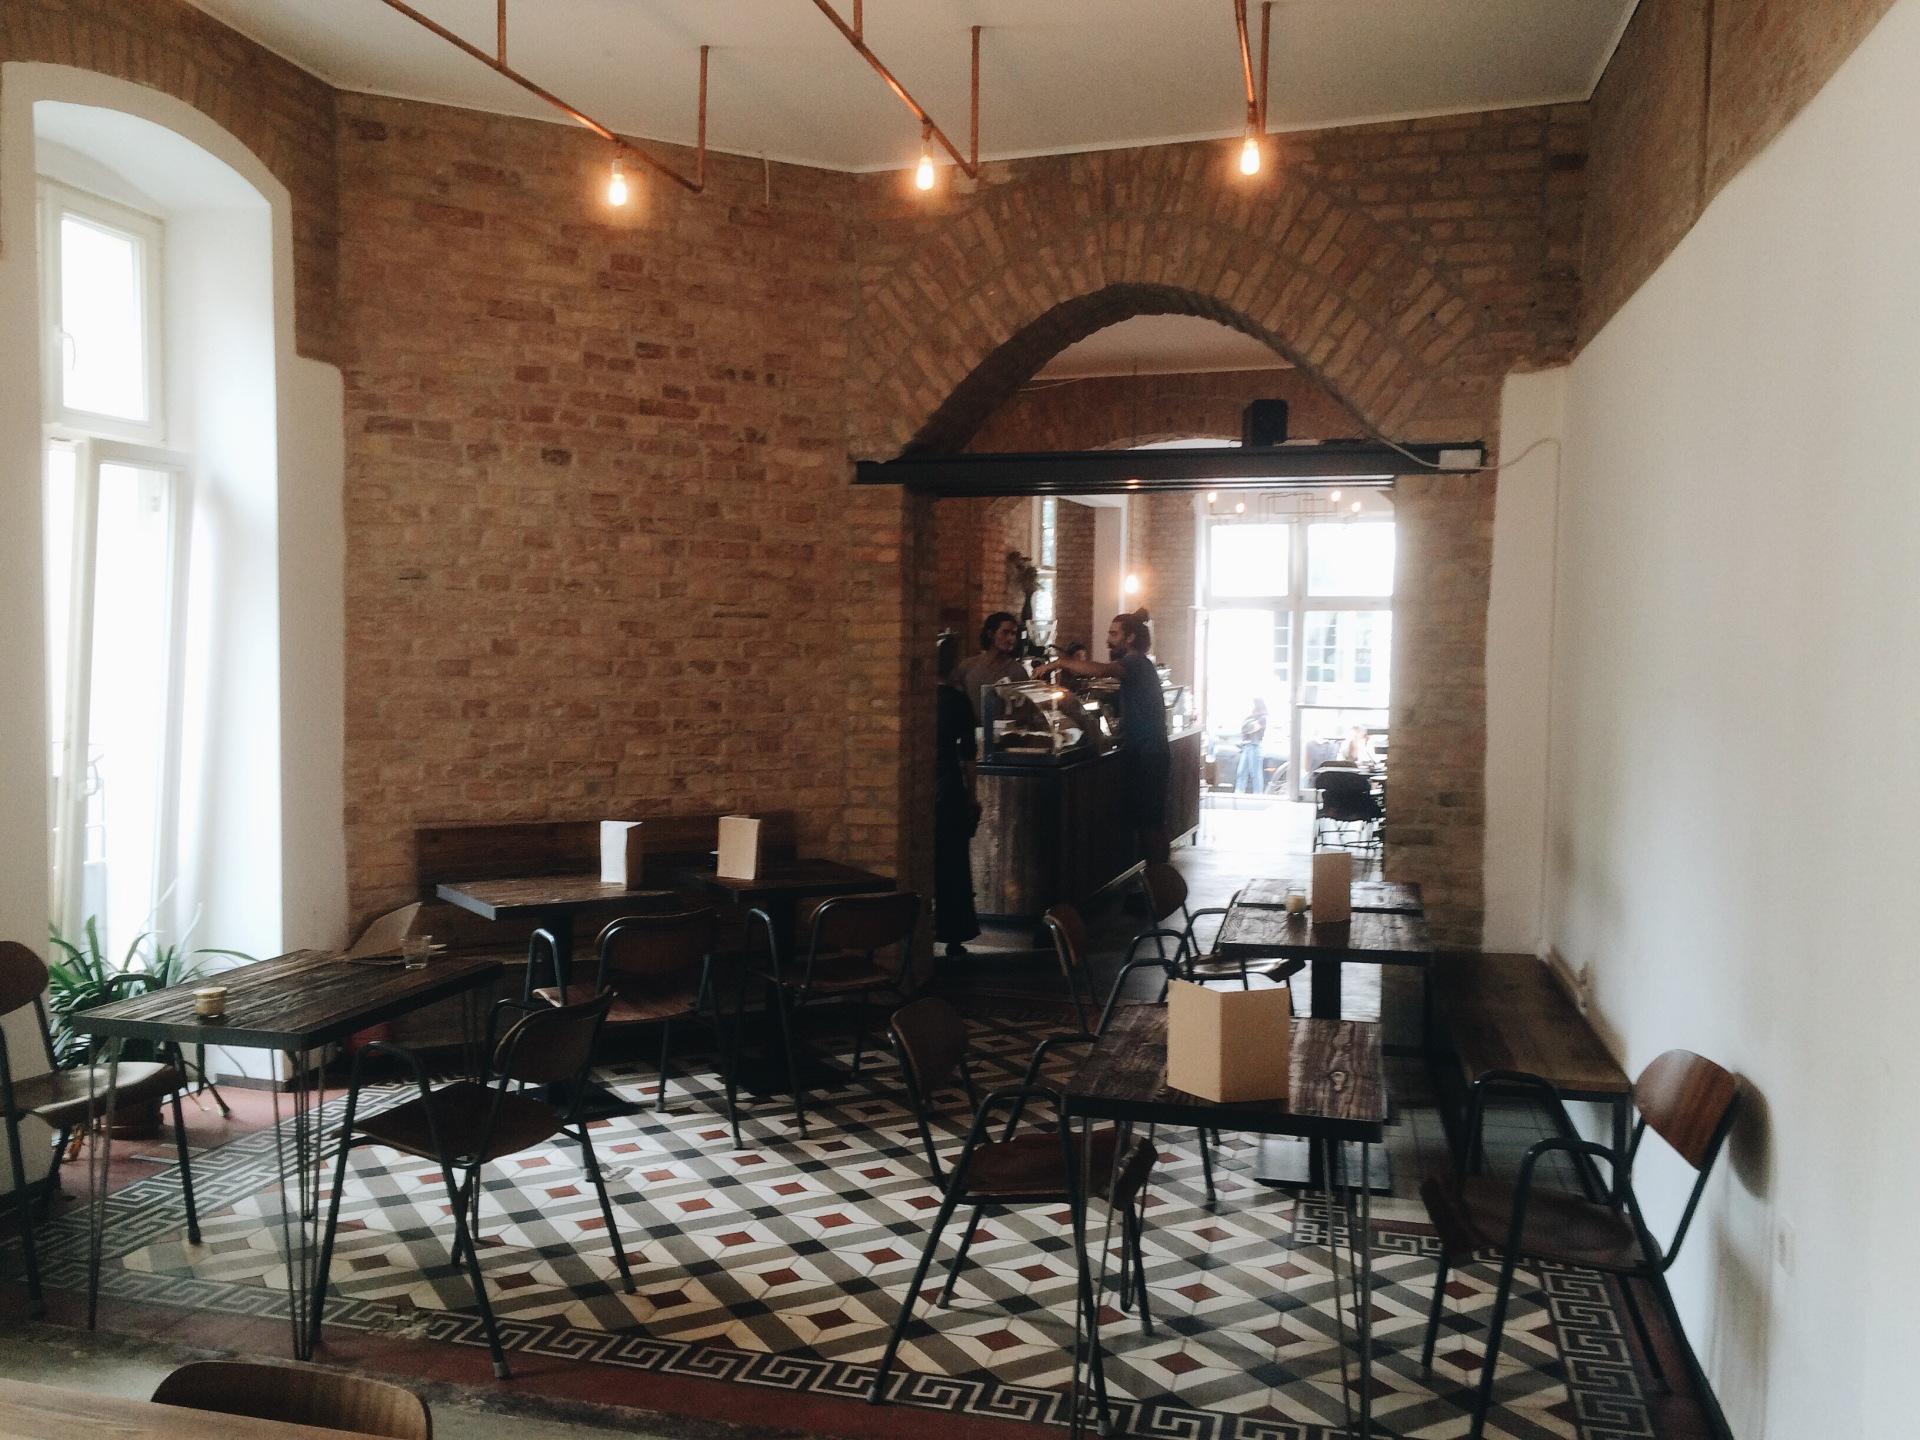 Craft Coffee in Berlin Distrikt Coffee